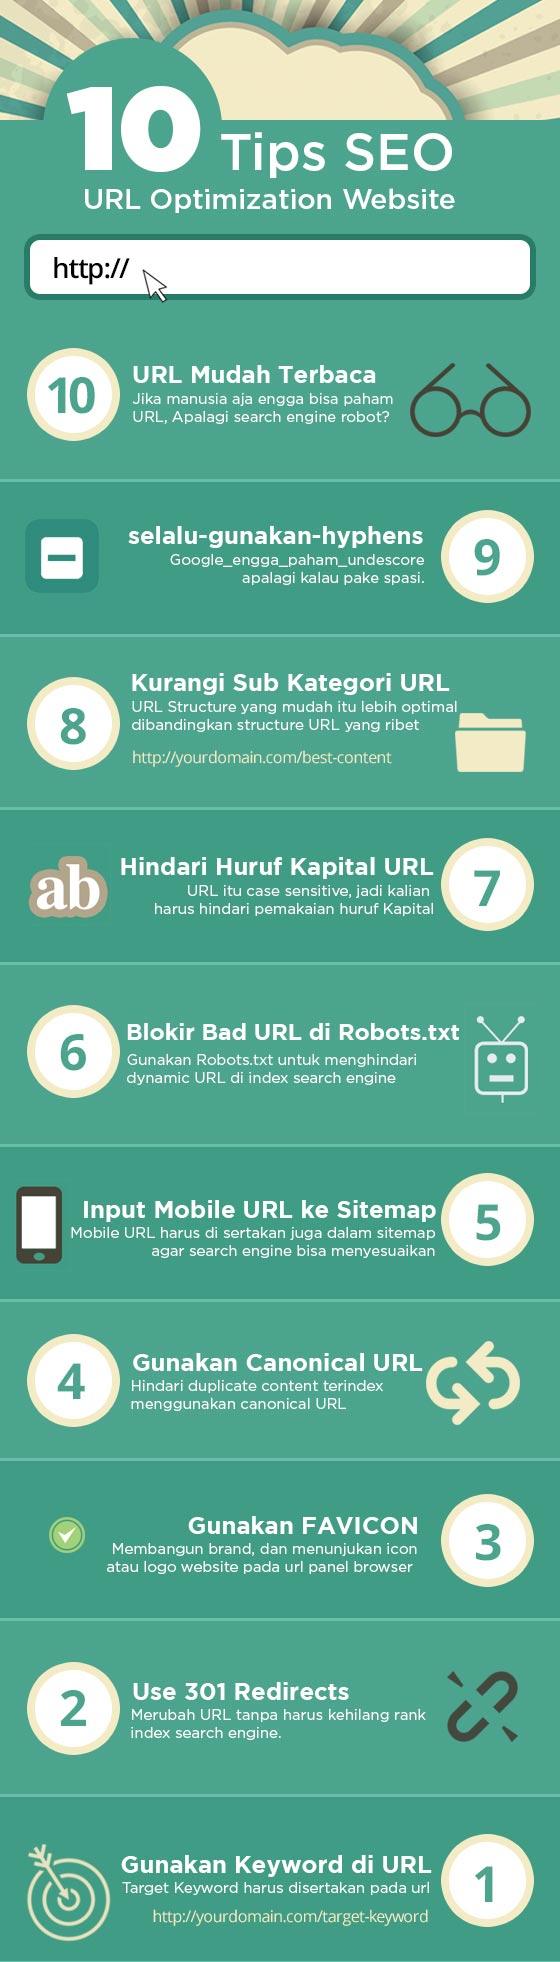 Tips SEO URL Optimization website wordpress